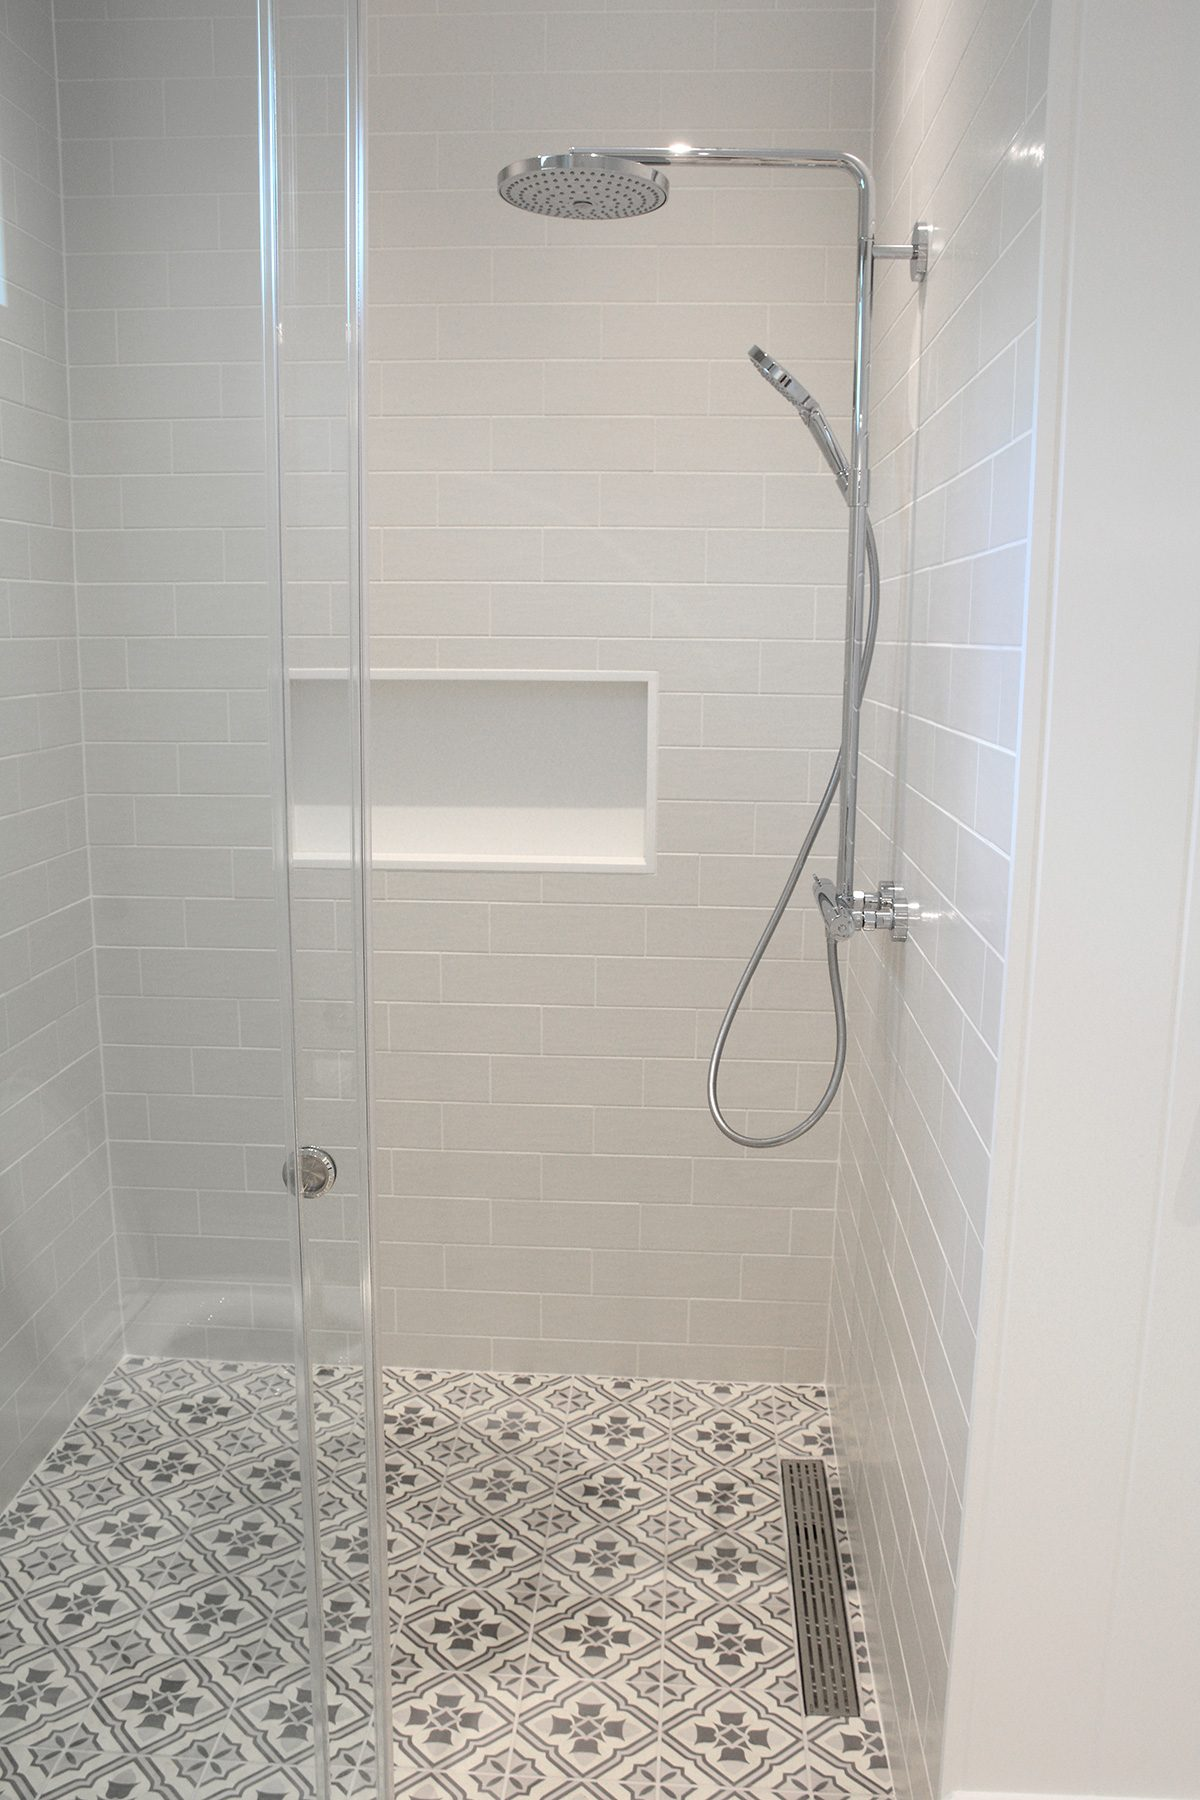 Bath image1